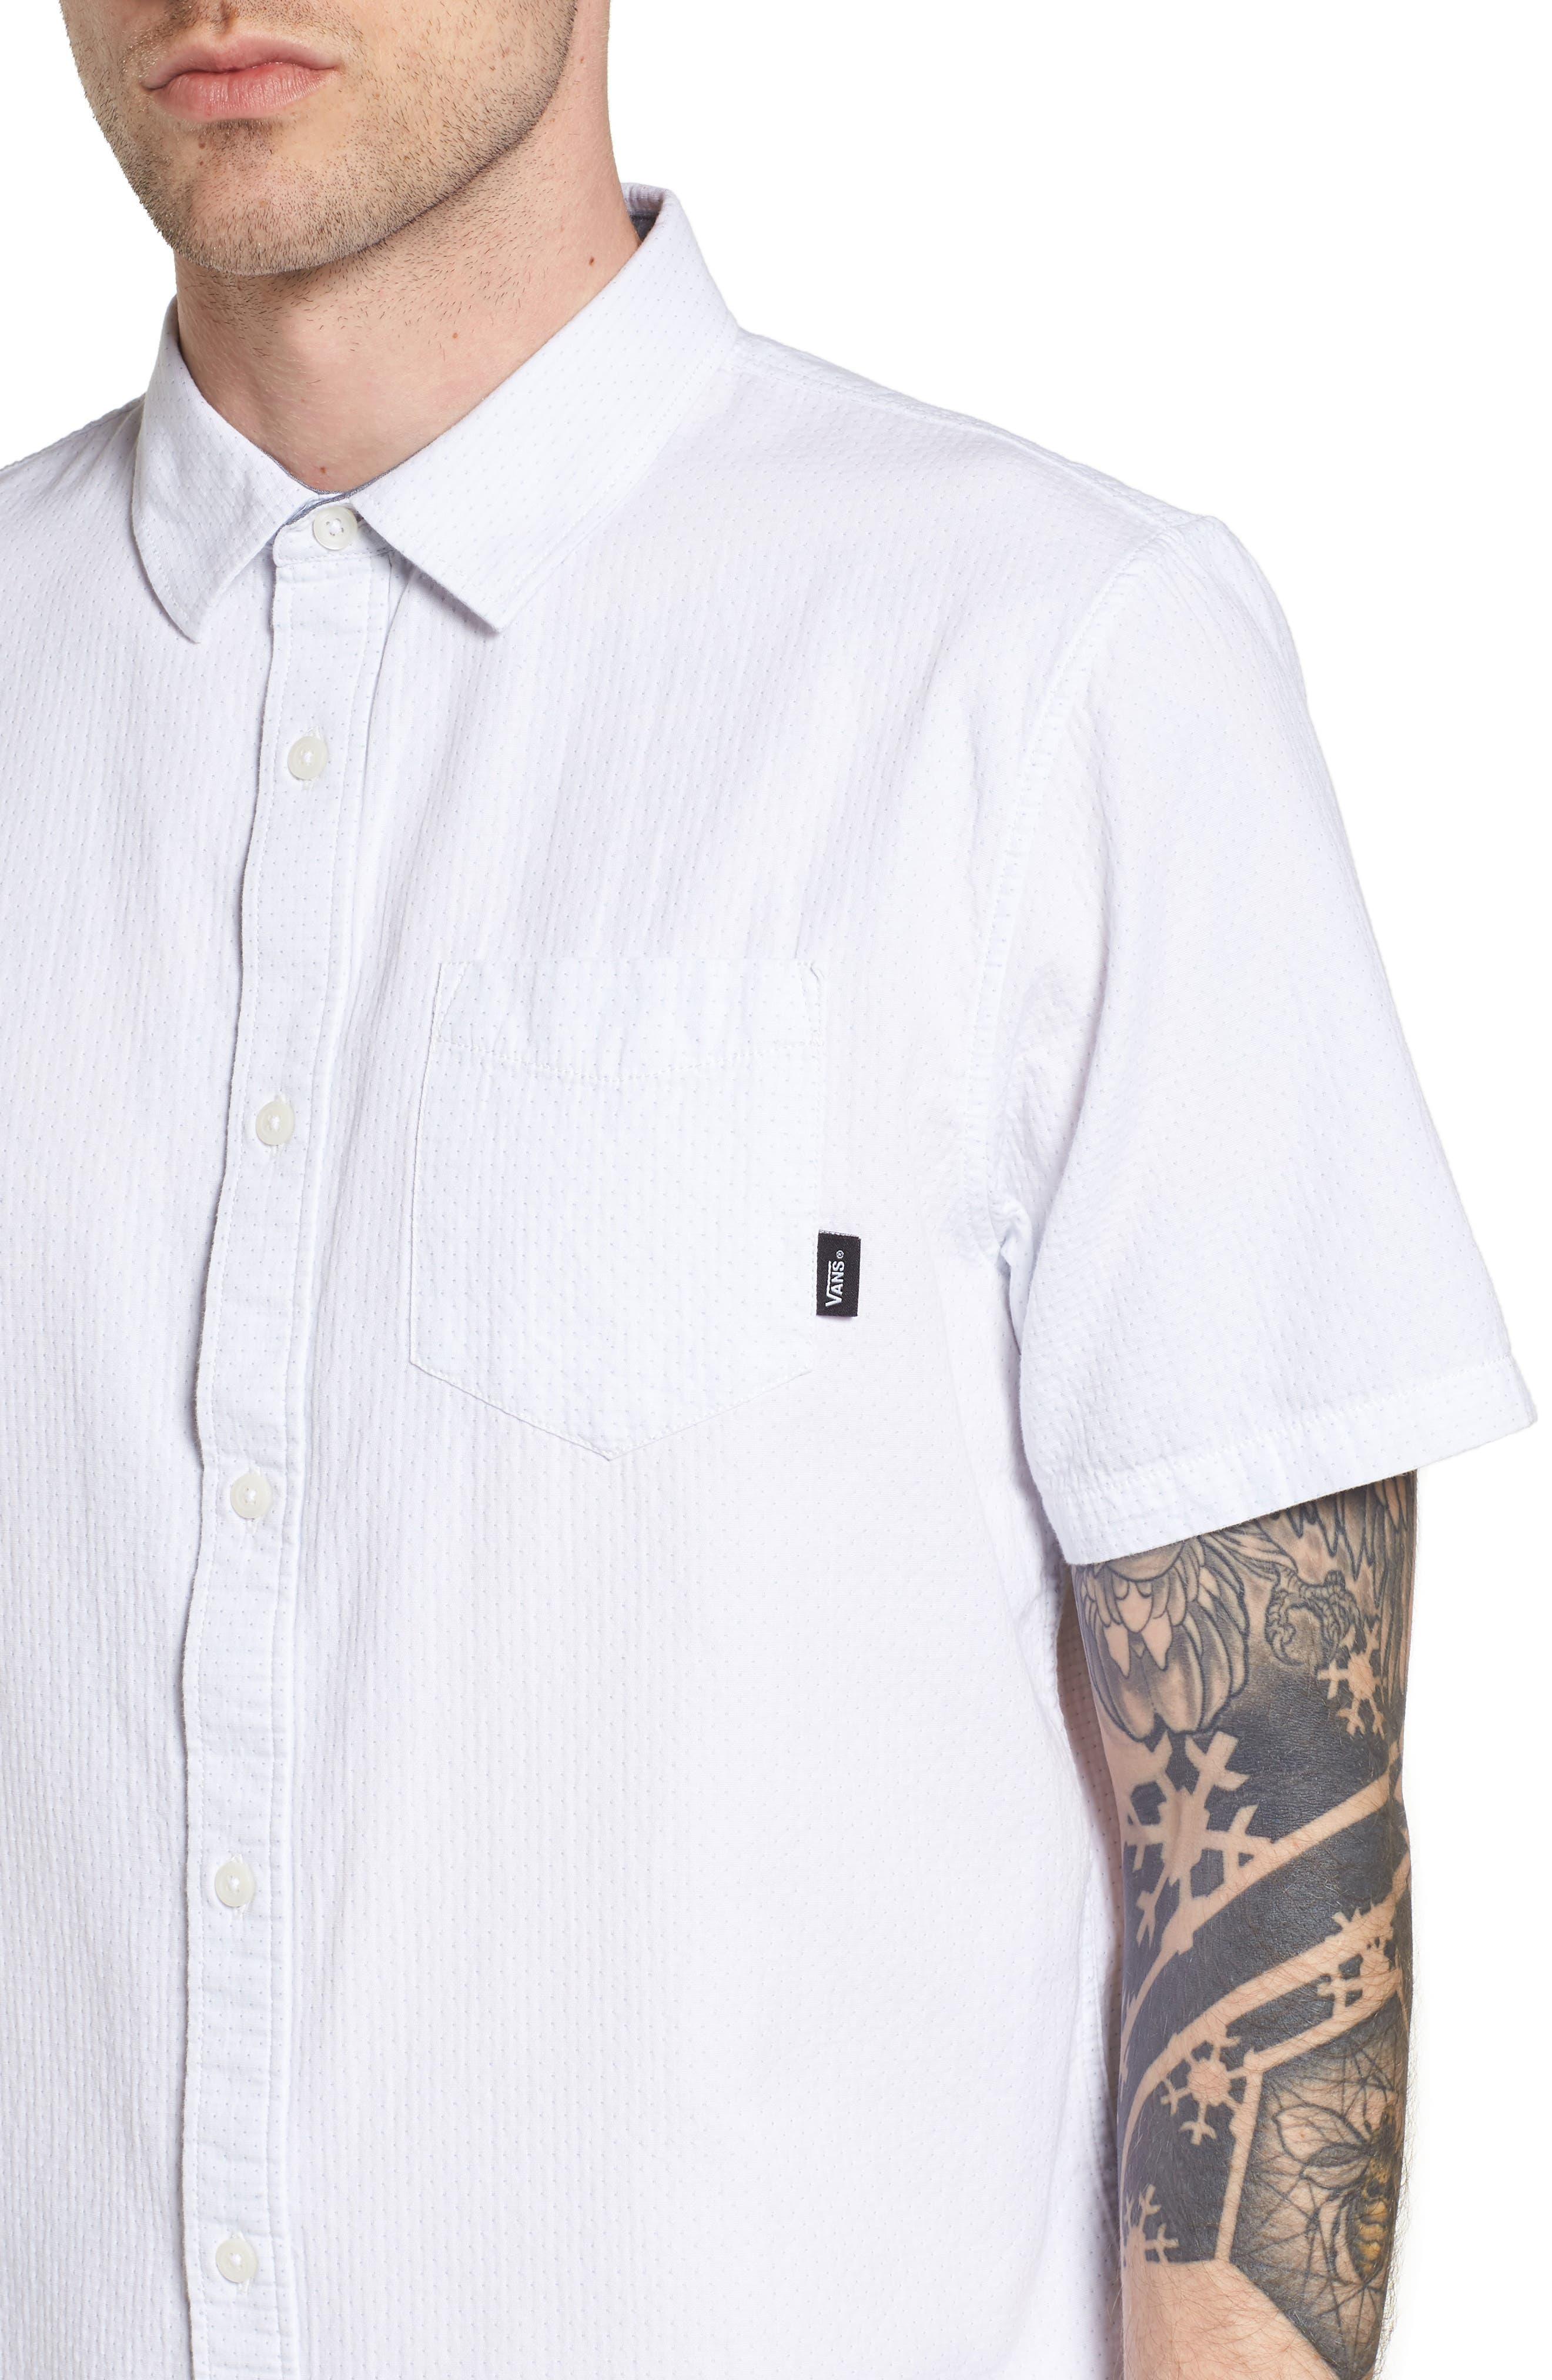 Fairdale Woven Shirt,                             Alternate thumbnail 2, color,                             White